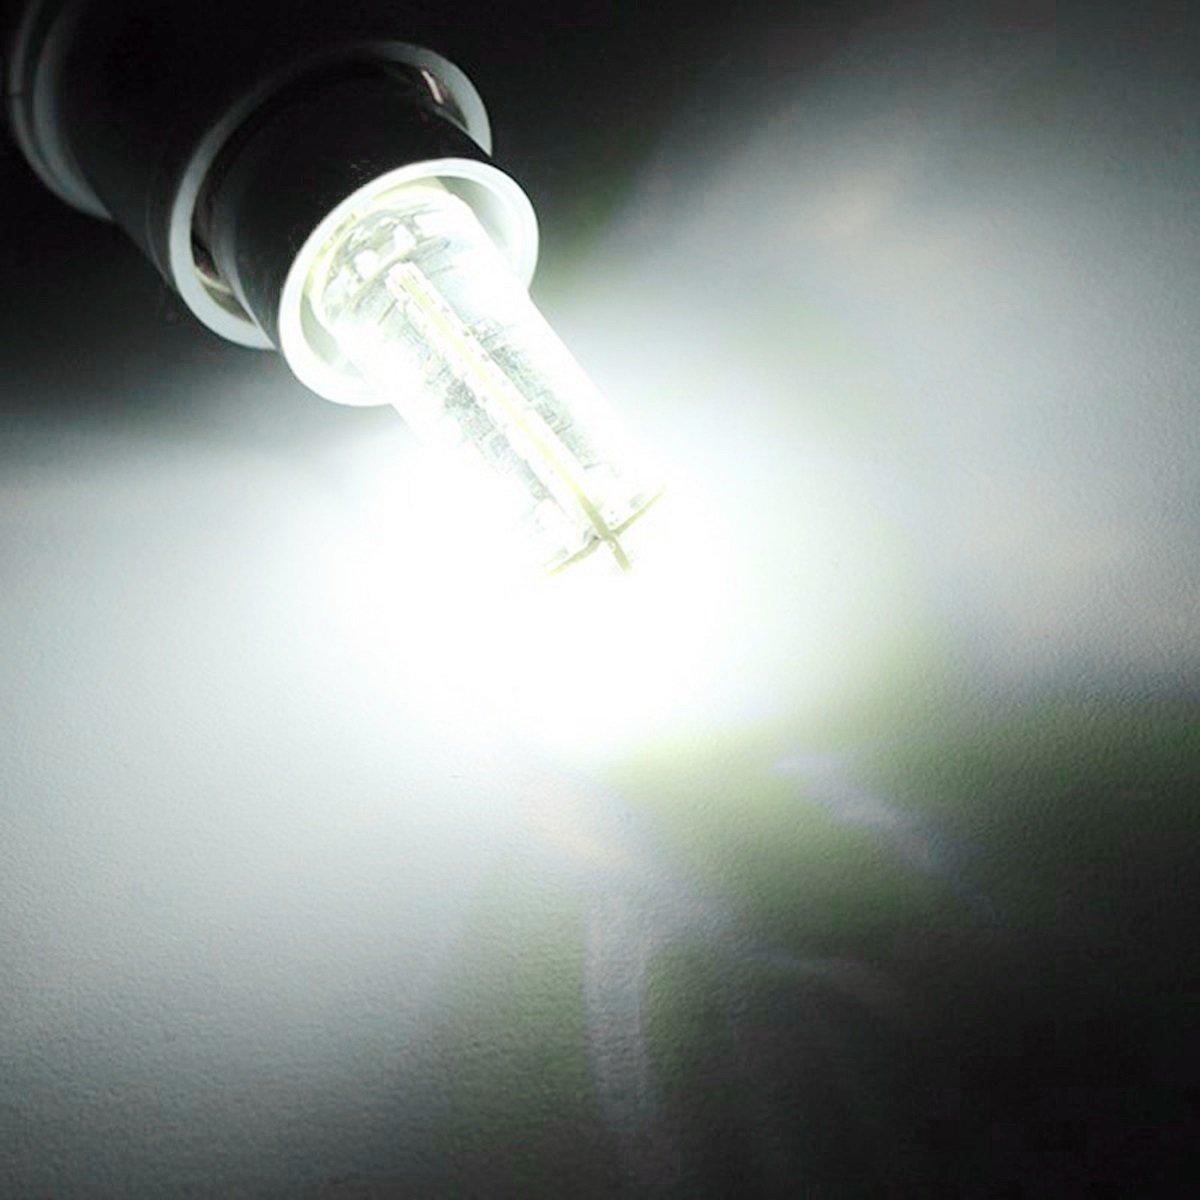 LLP-LED Dimmable LED Lights LED Bulb E17 5W 80LED 5730SMD 400-500Lm Warm White Cool White AC 220 V//AC 110V Color : AC110V, Size : Warm White 5PCS